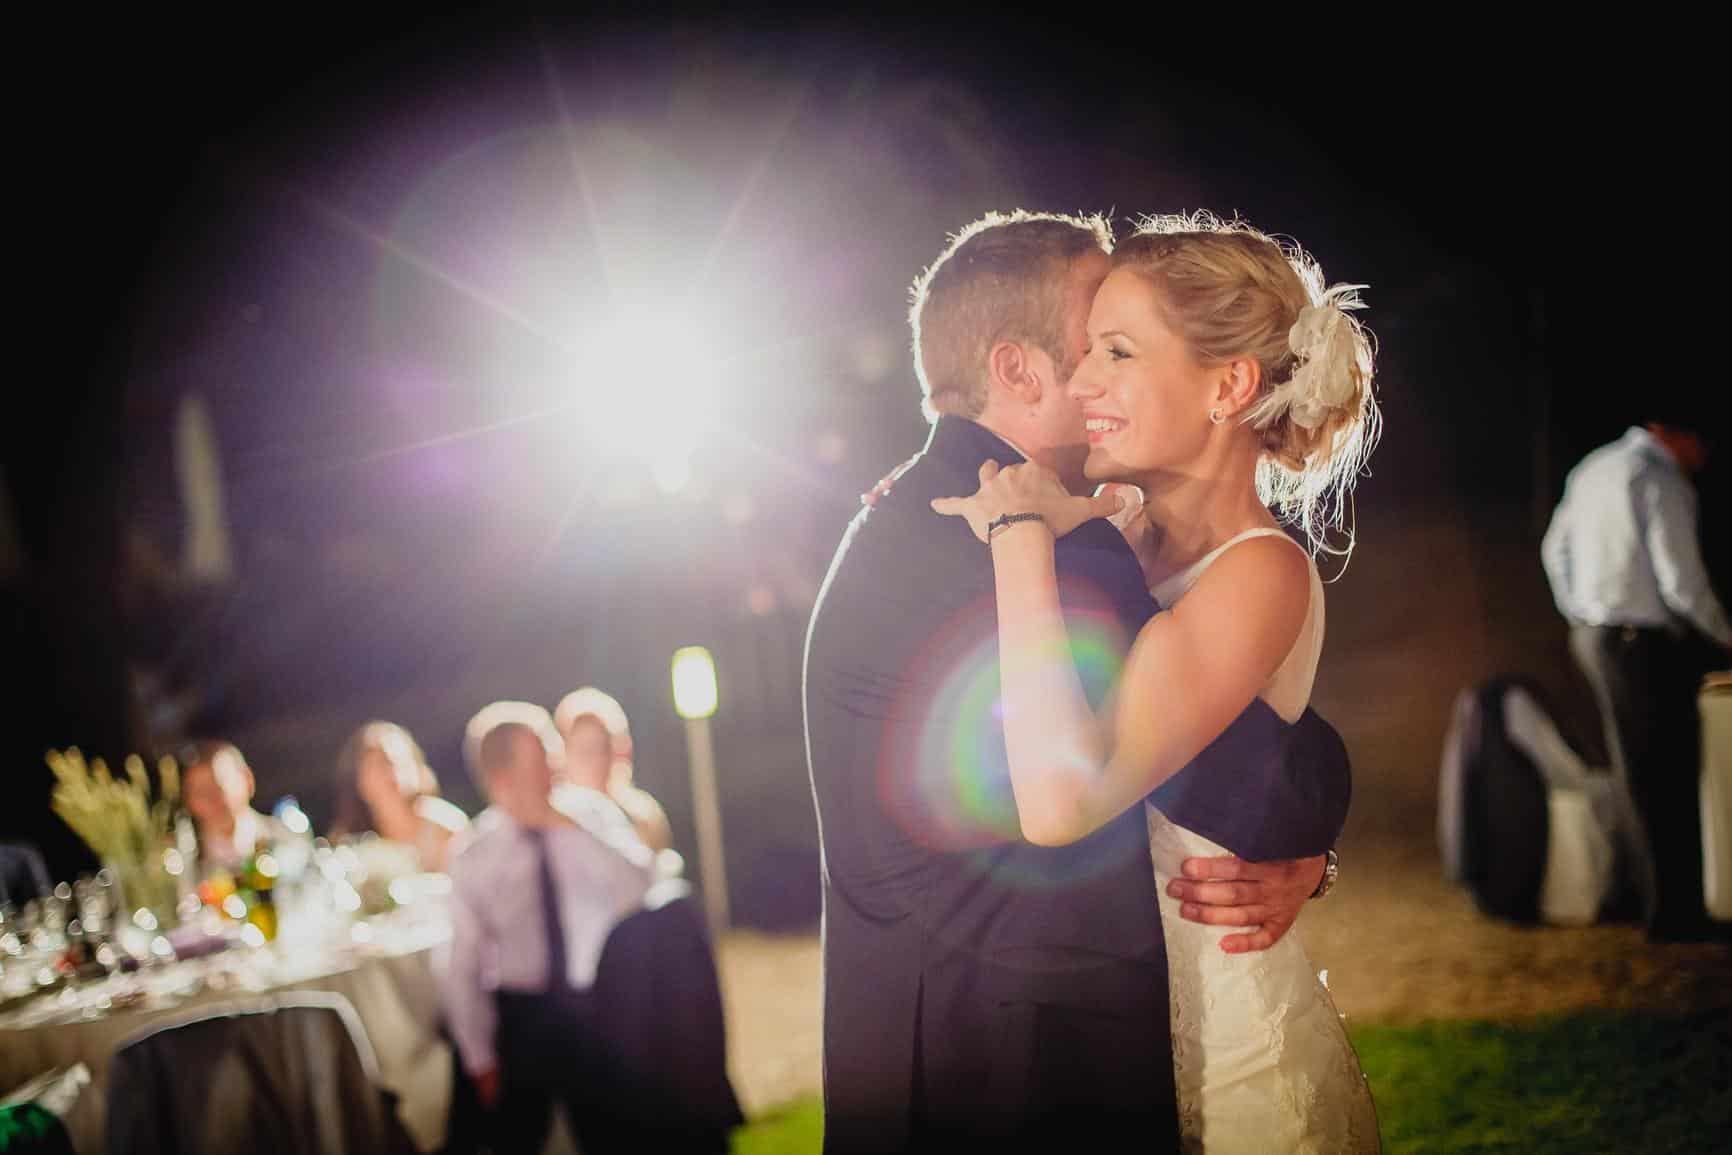 Photographic -  Destination wedding photography 2251 ΓΑΜΟΣ & ΒΑΠΤΙΣΗ ΣΤΟ ΚΤΗΜΑ AQUADOME